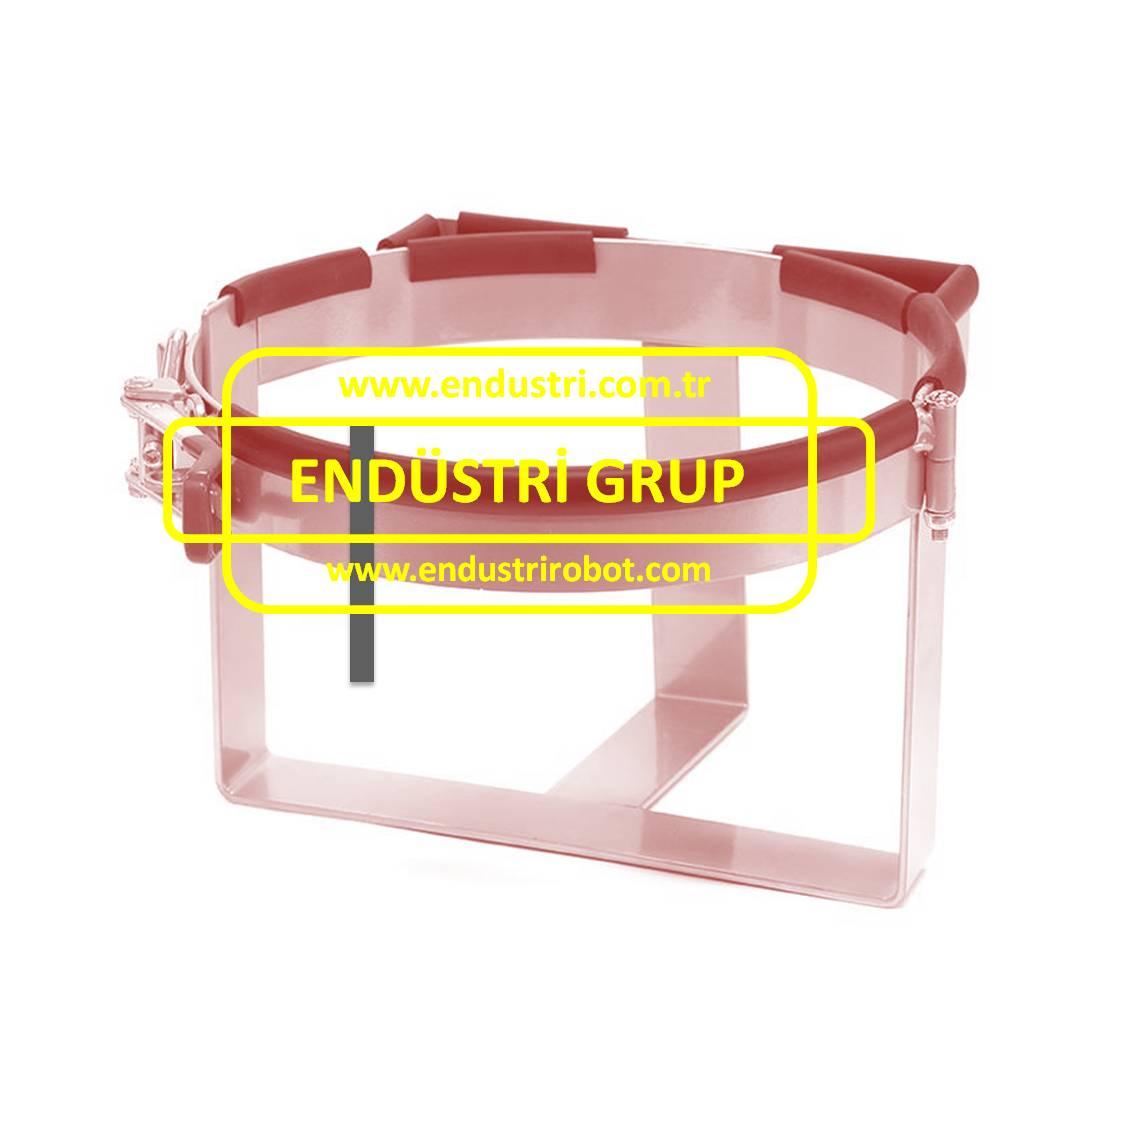 karavan-tipi-tup-sabitleme-tasima-standi-aparati-ekipmani-modelleri-fiyati